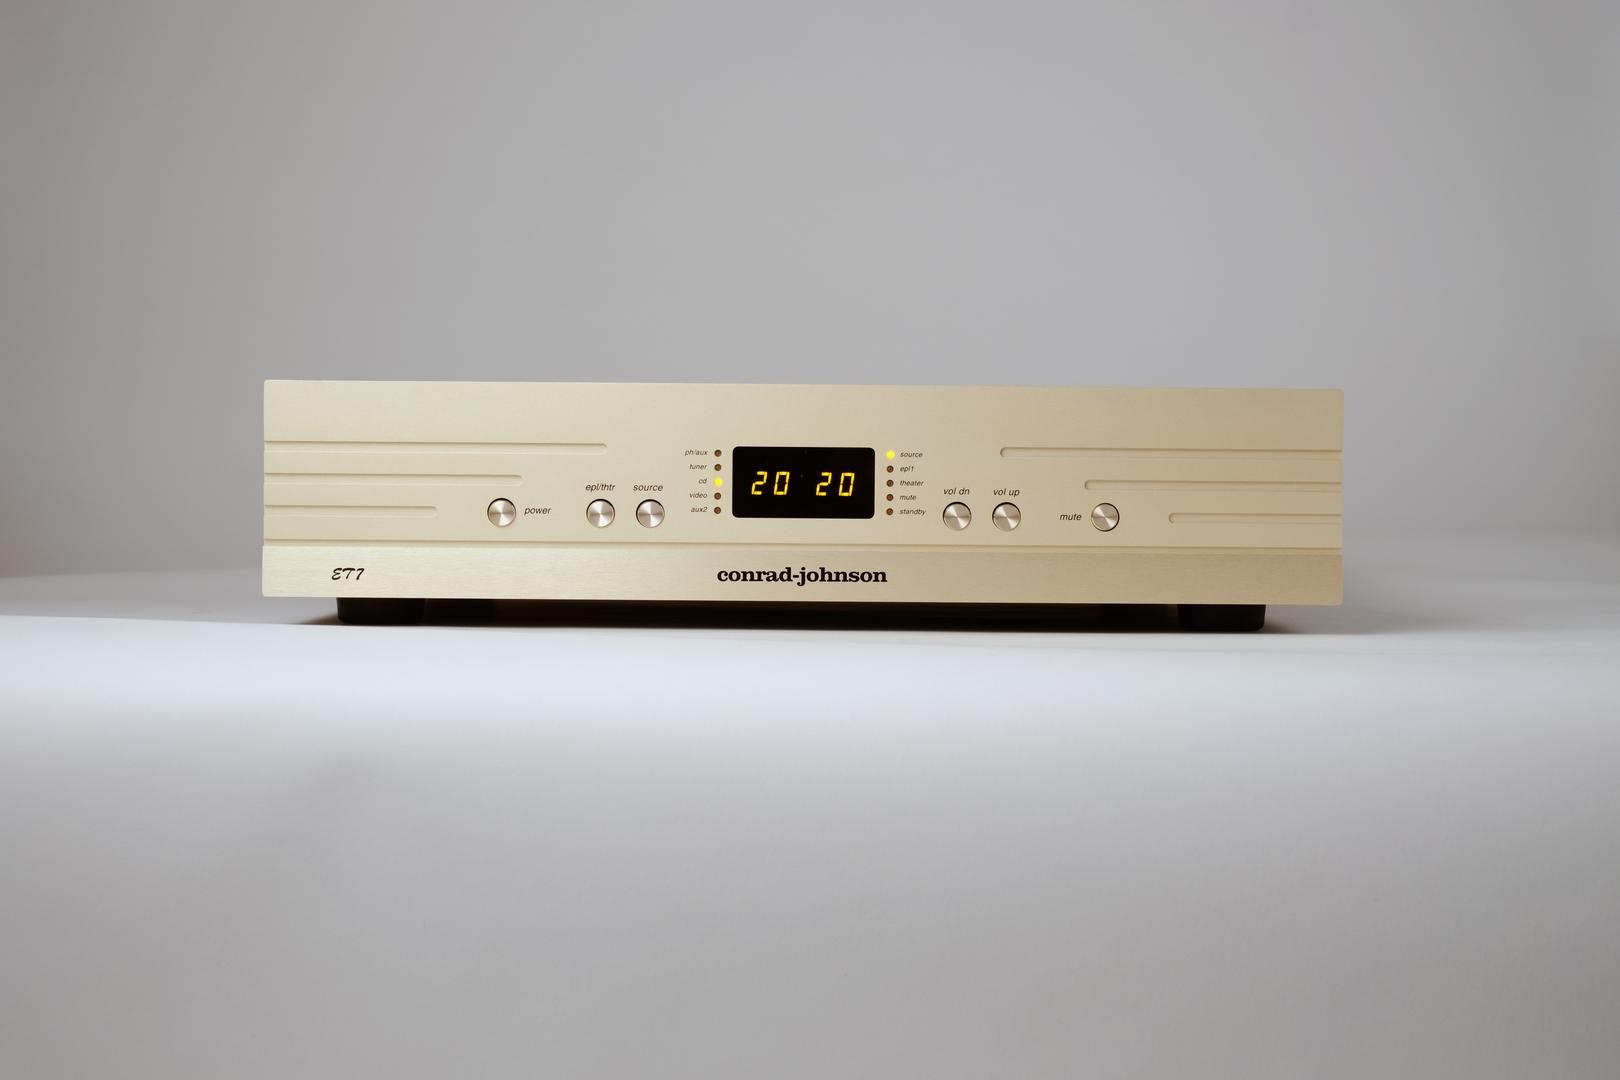 conrad-johnson ET7-S2 line preamplifier